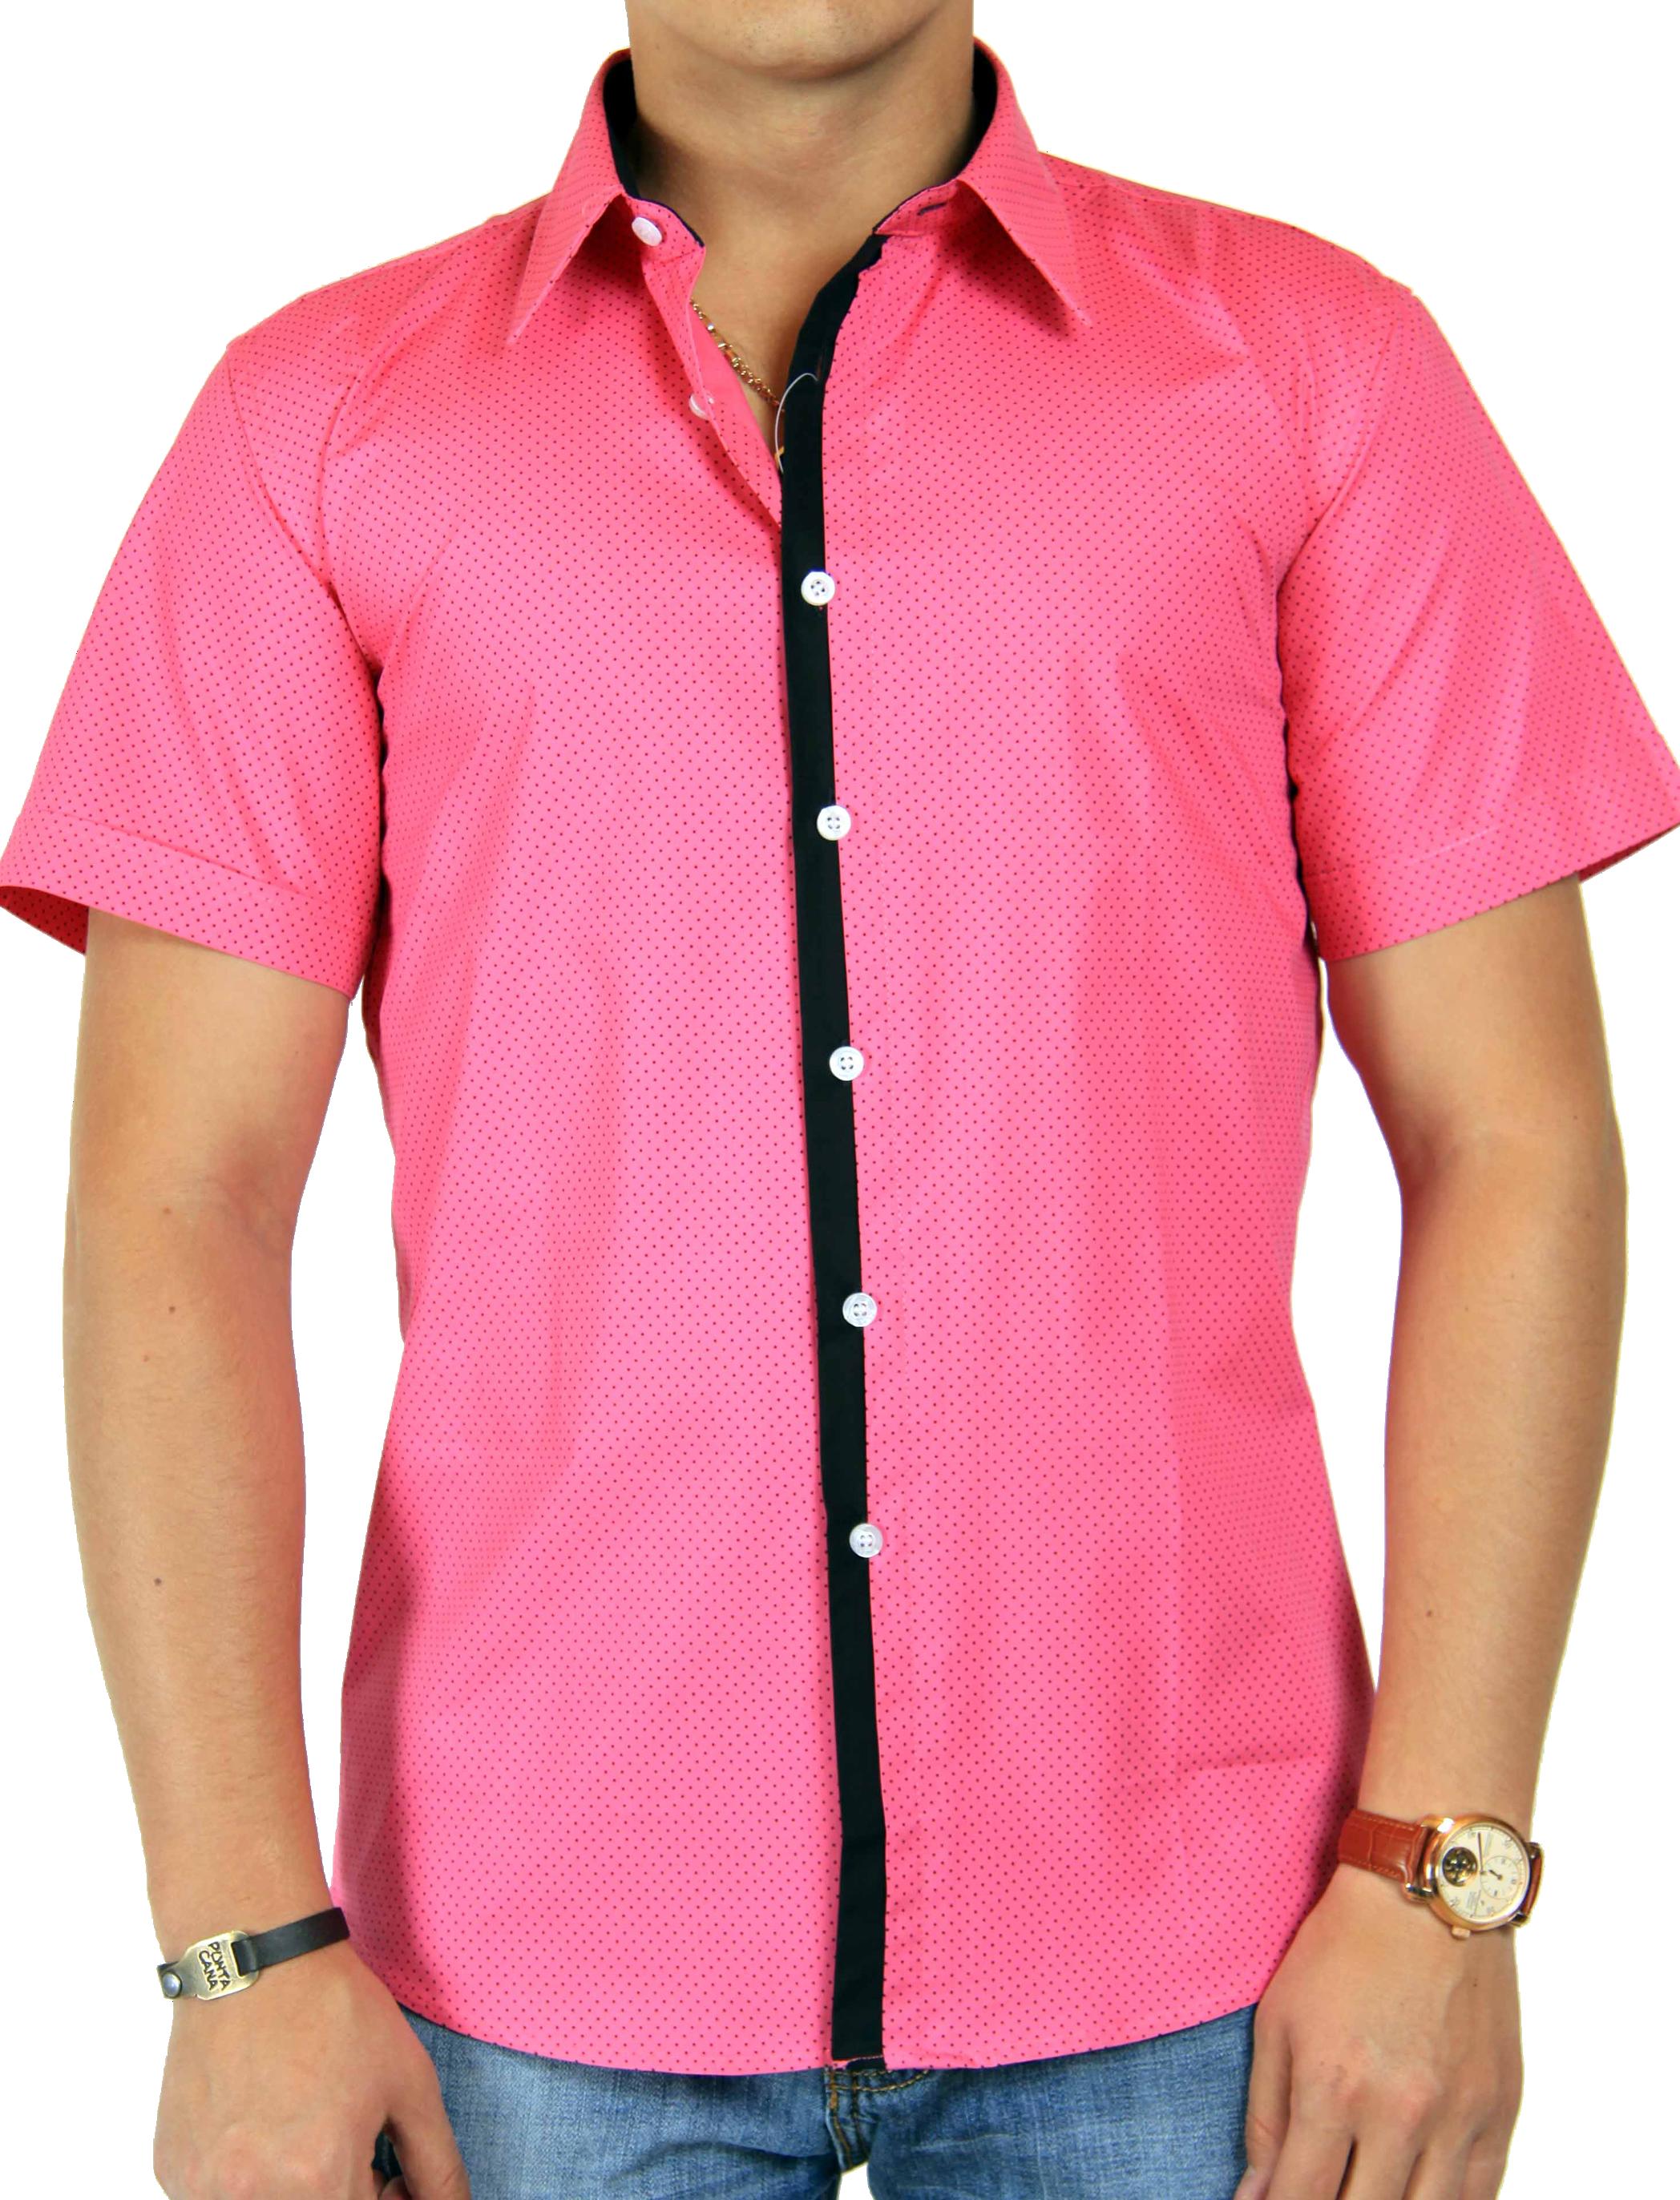 Dot Printed Pink Half Shirt PNG Image